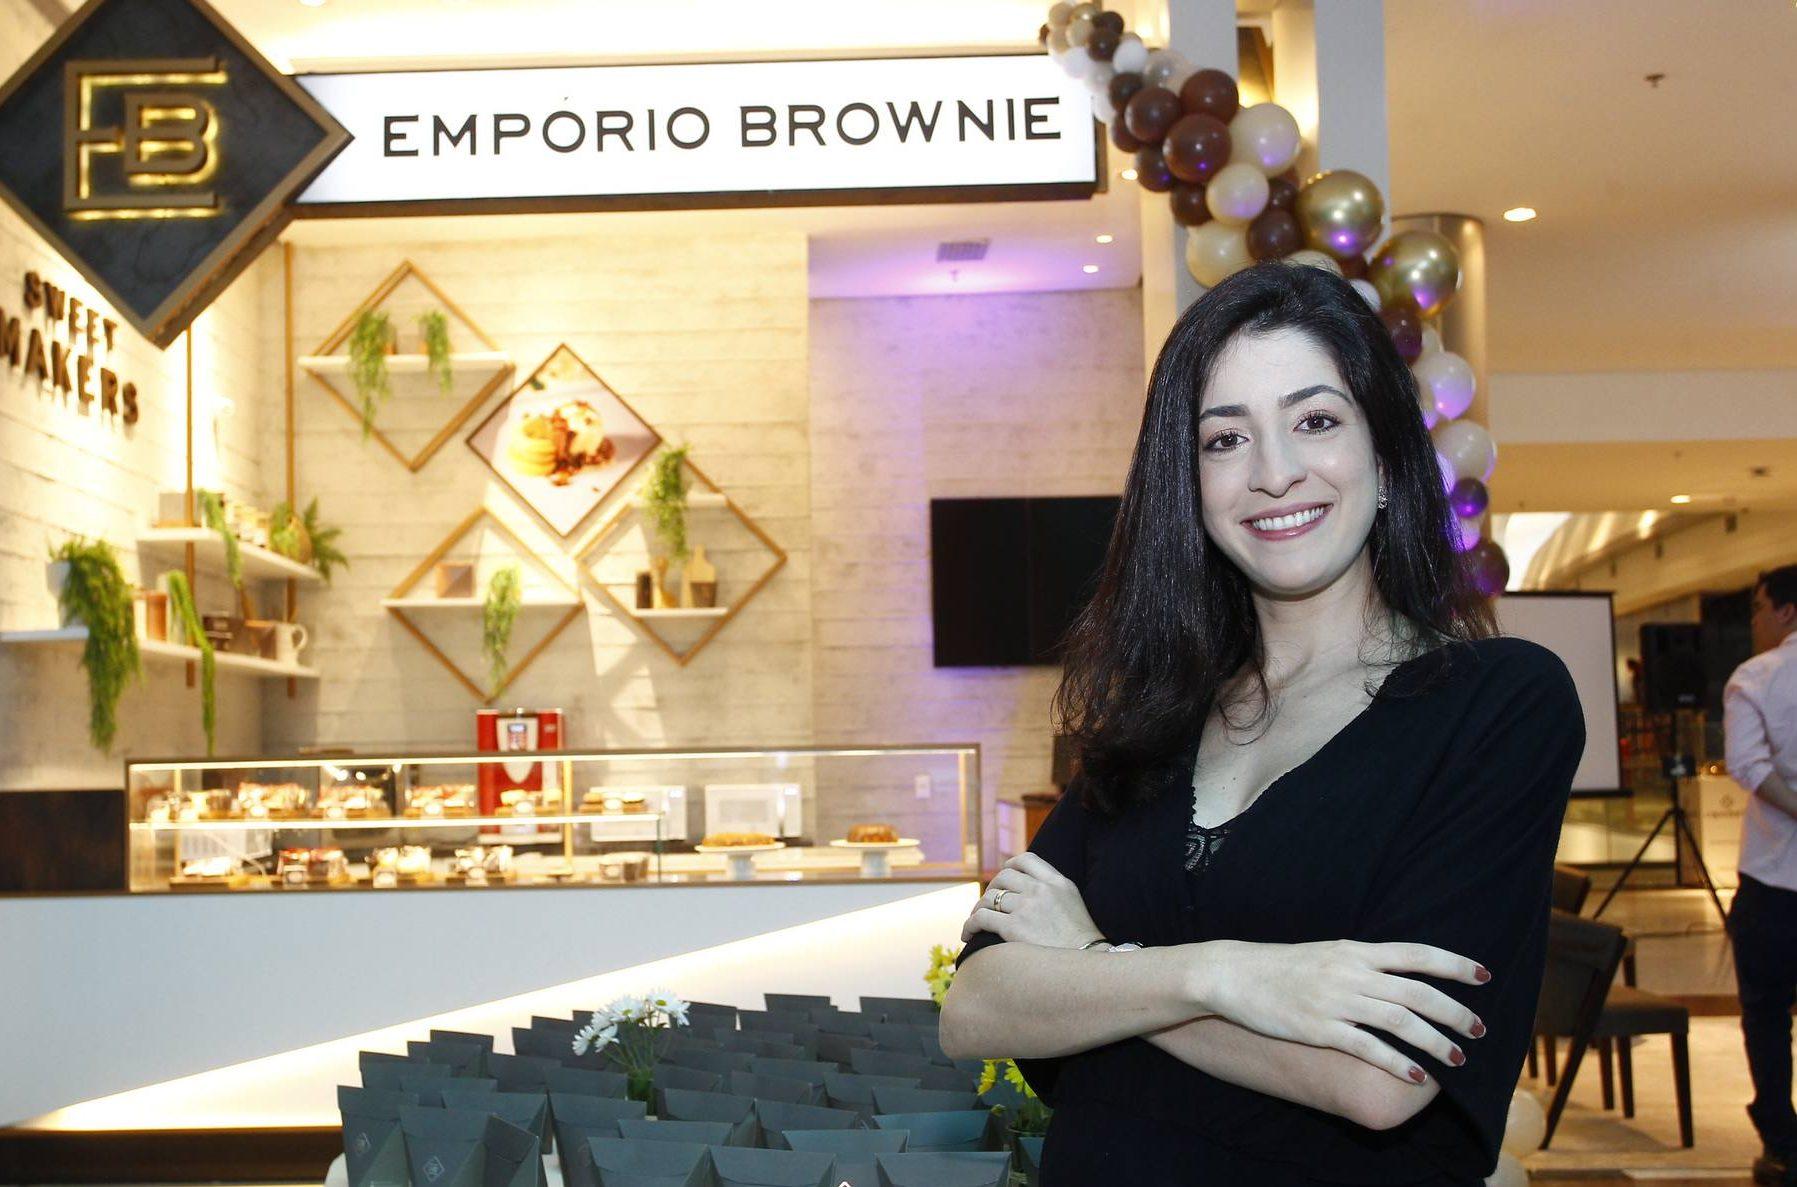 Mila Ary apresenta projeto de rebranding na loja Empório Brownie do Iguatemi